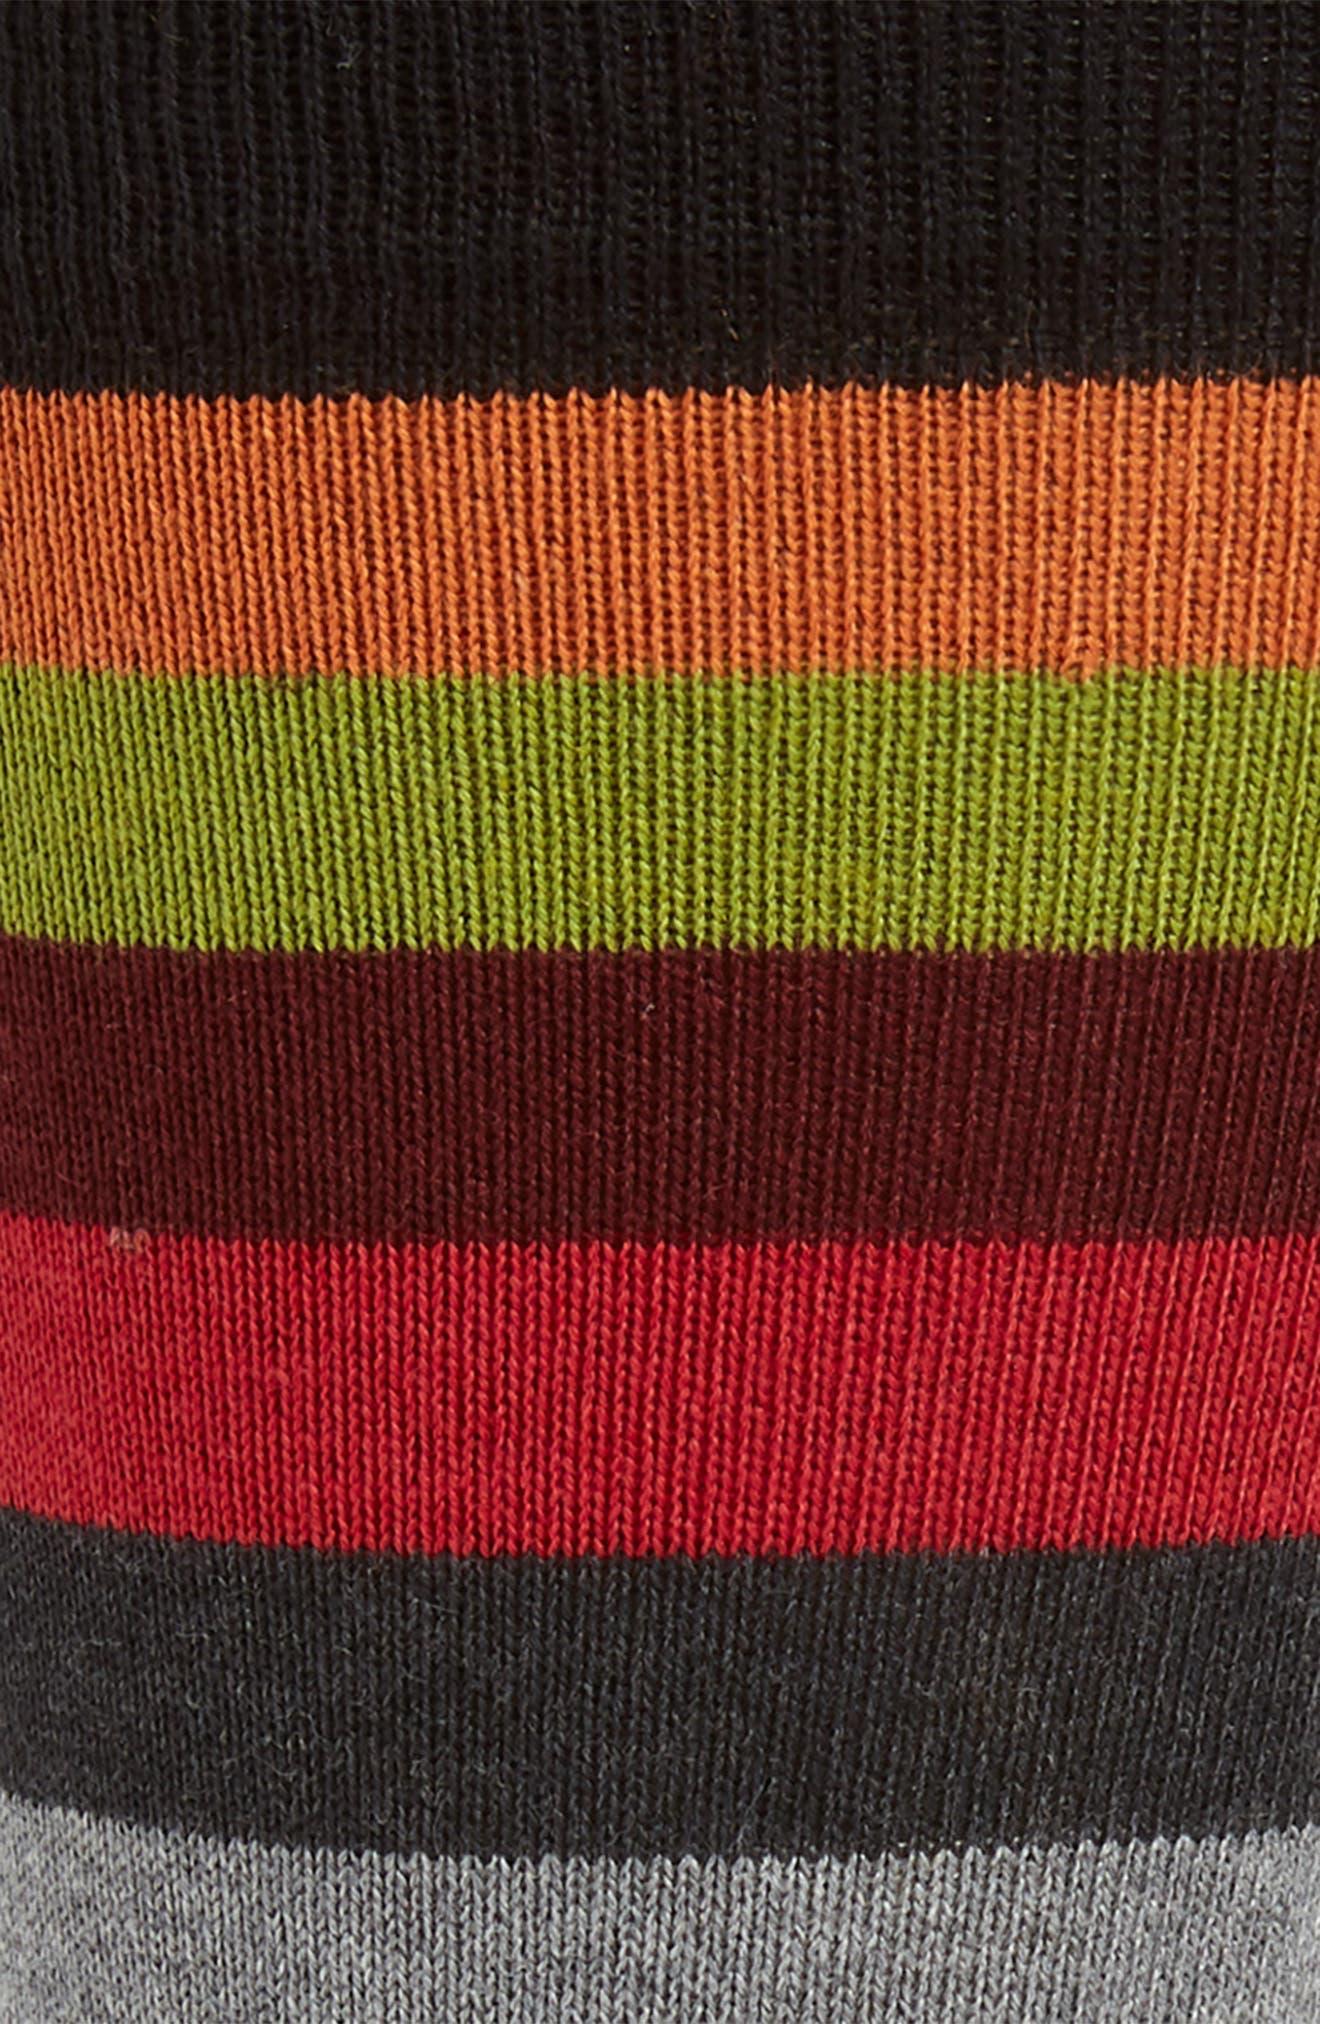 Stripe Socks,                             Alternate thumbnail 2, color,                             BLACK